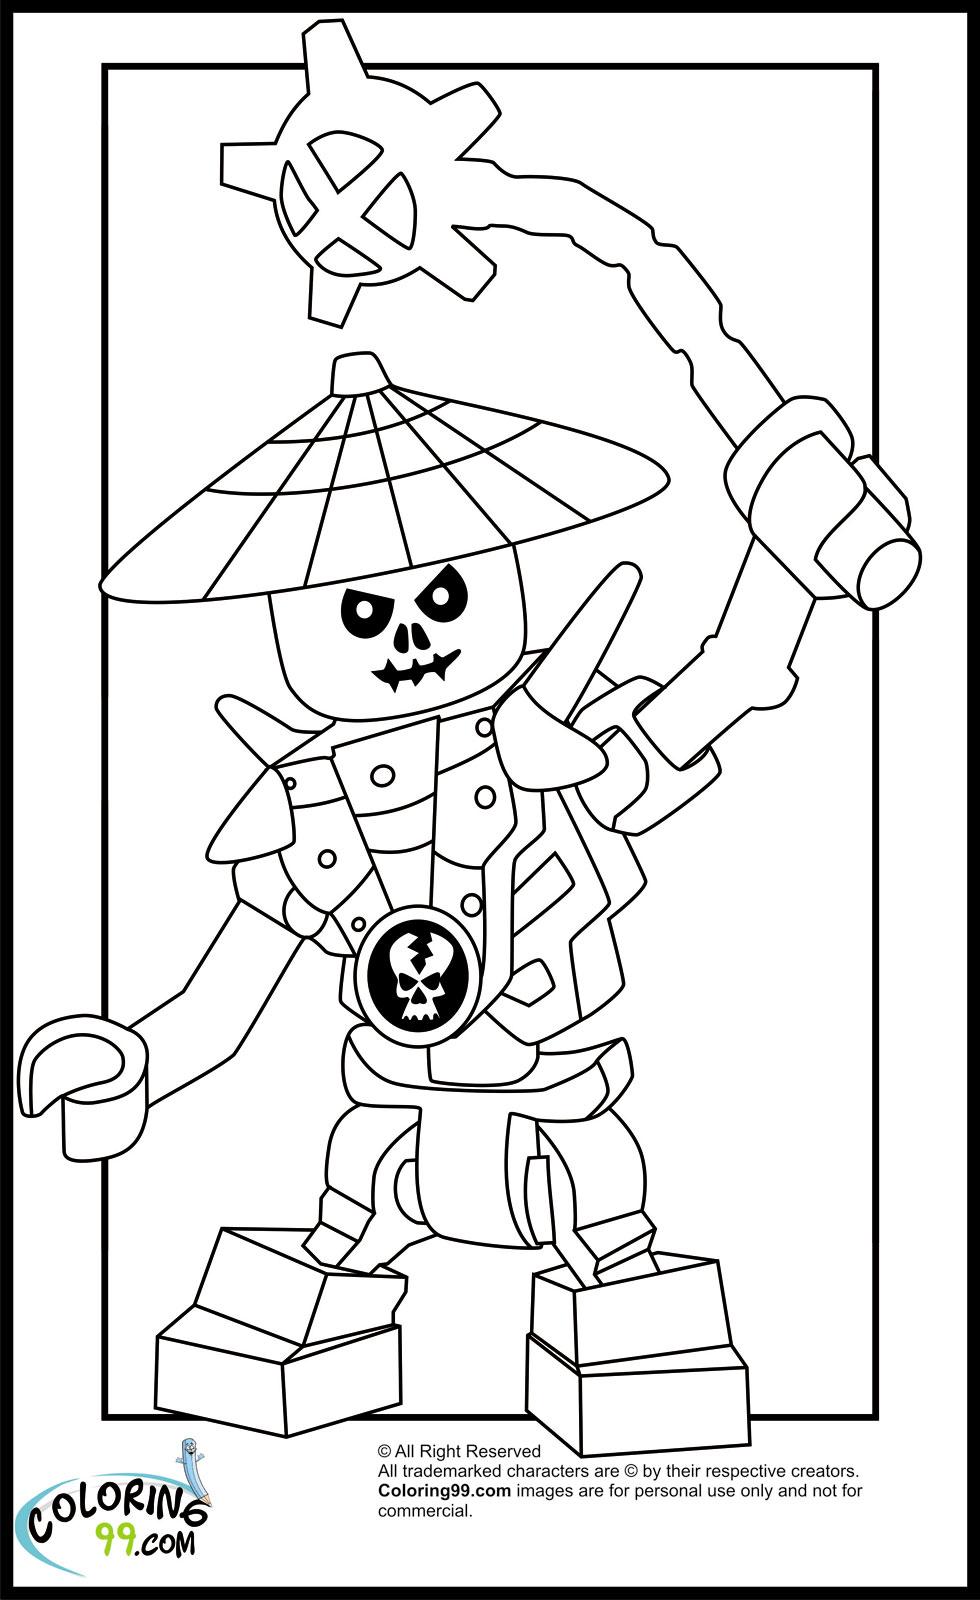 Coloriage ninjago gratuit - dessin a imprimer #145